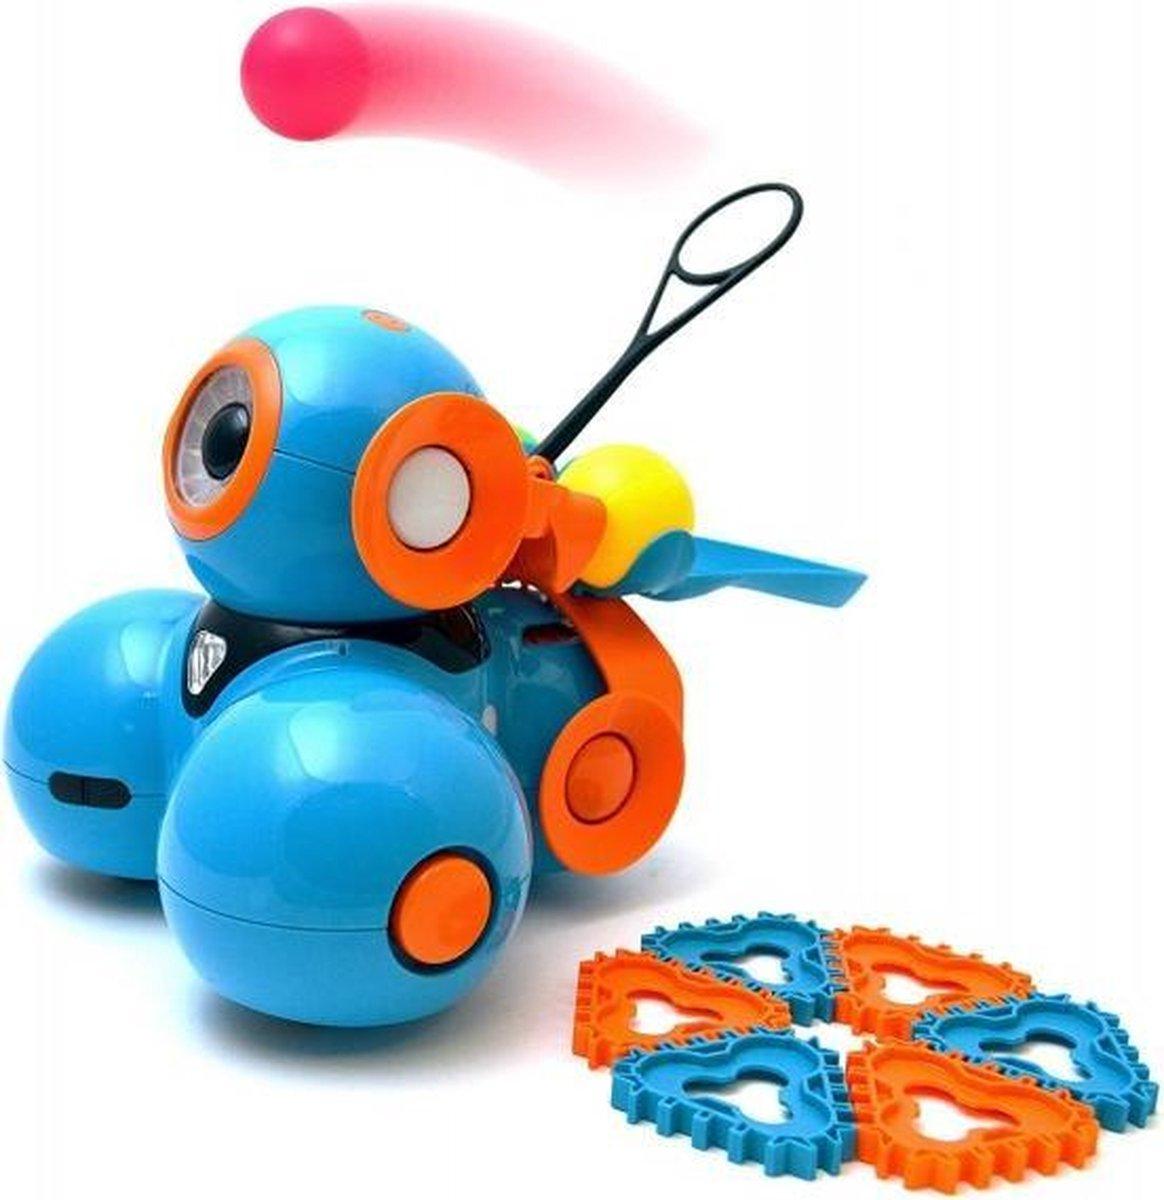 Dash & Dot Launcher